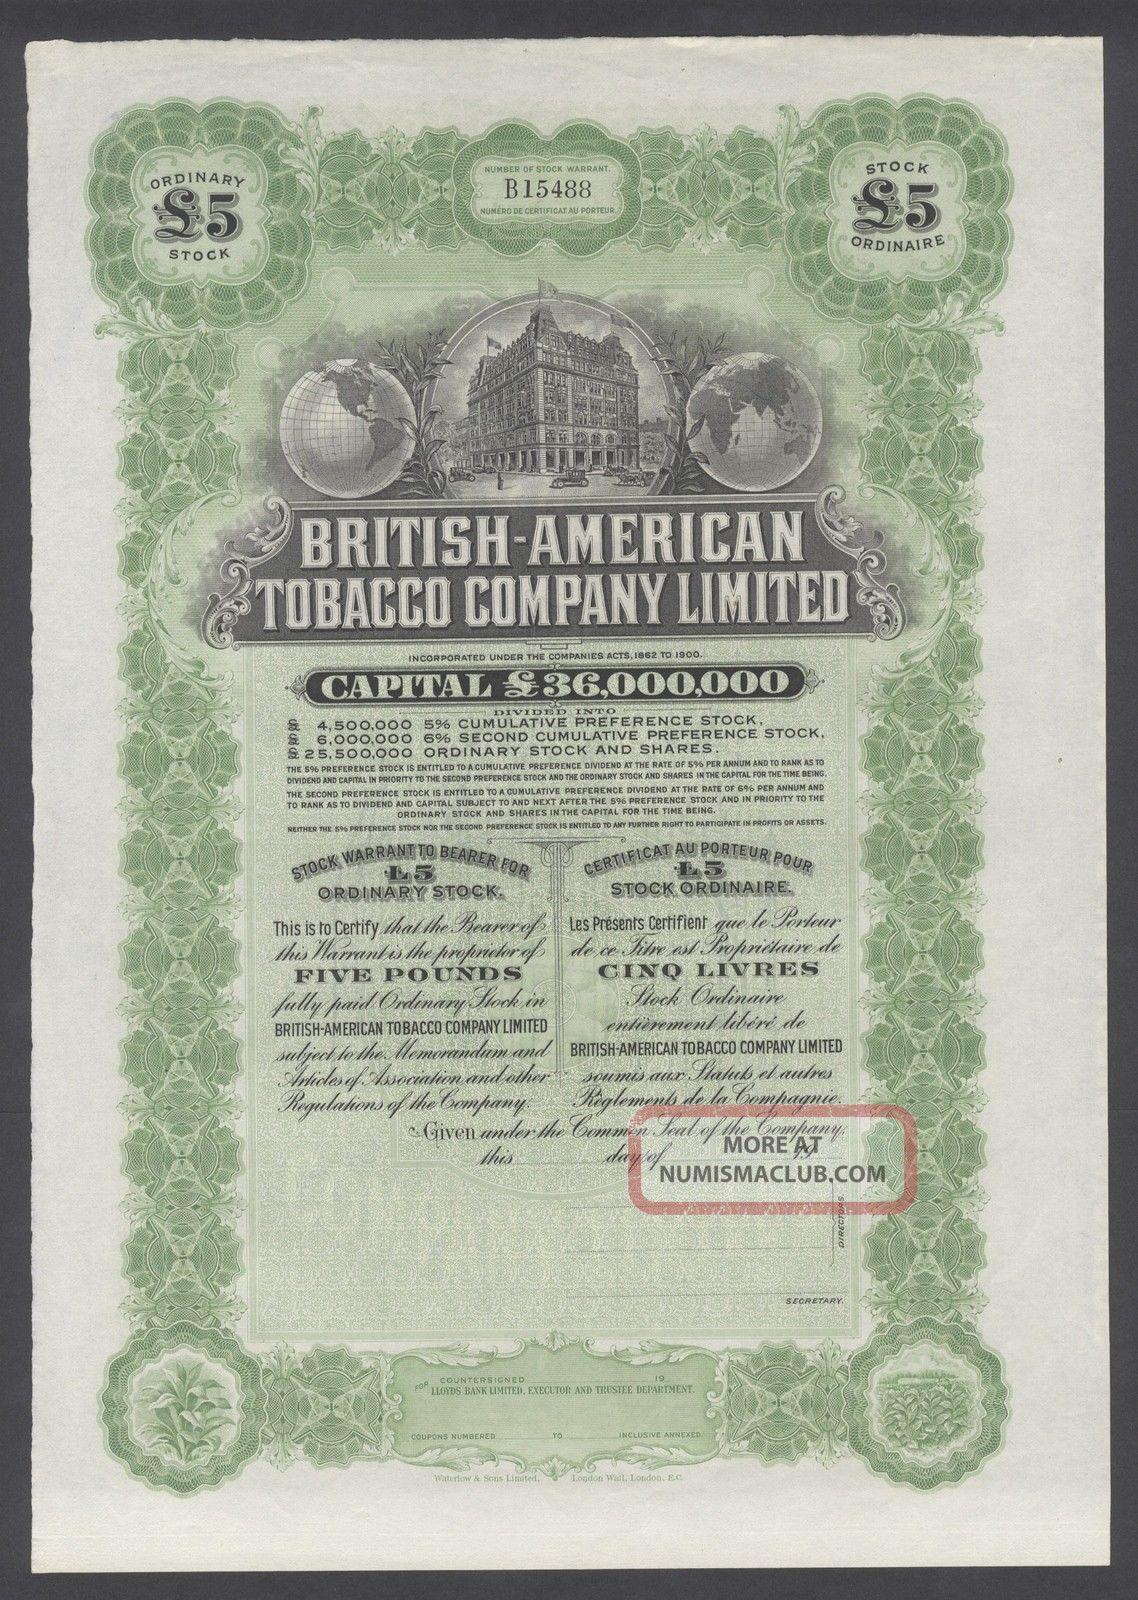 United States 1900s Uncirculated Ornate Bond British - American Tobacco Co.  R3332 World photo